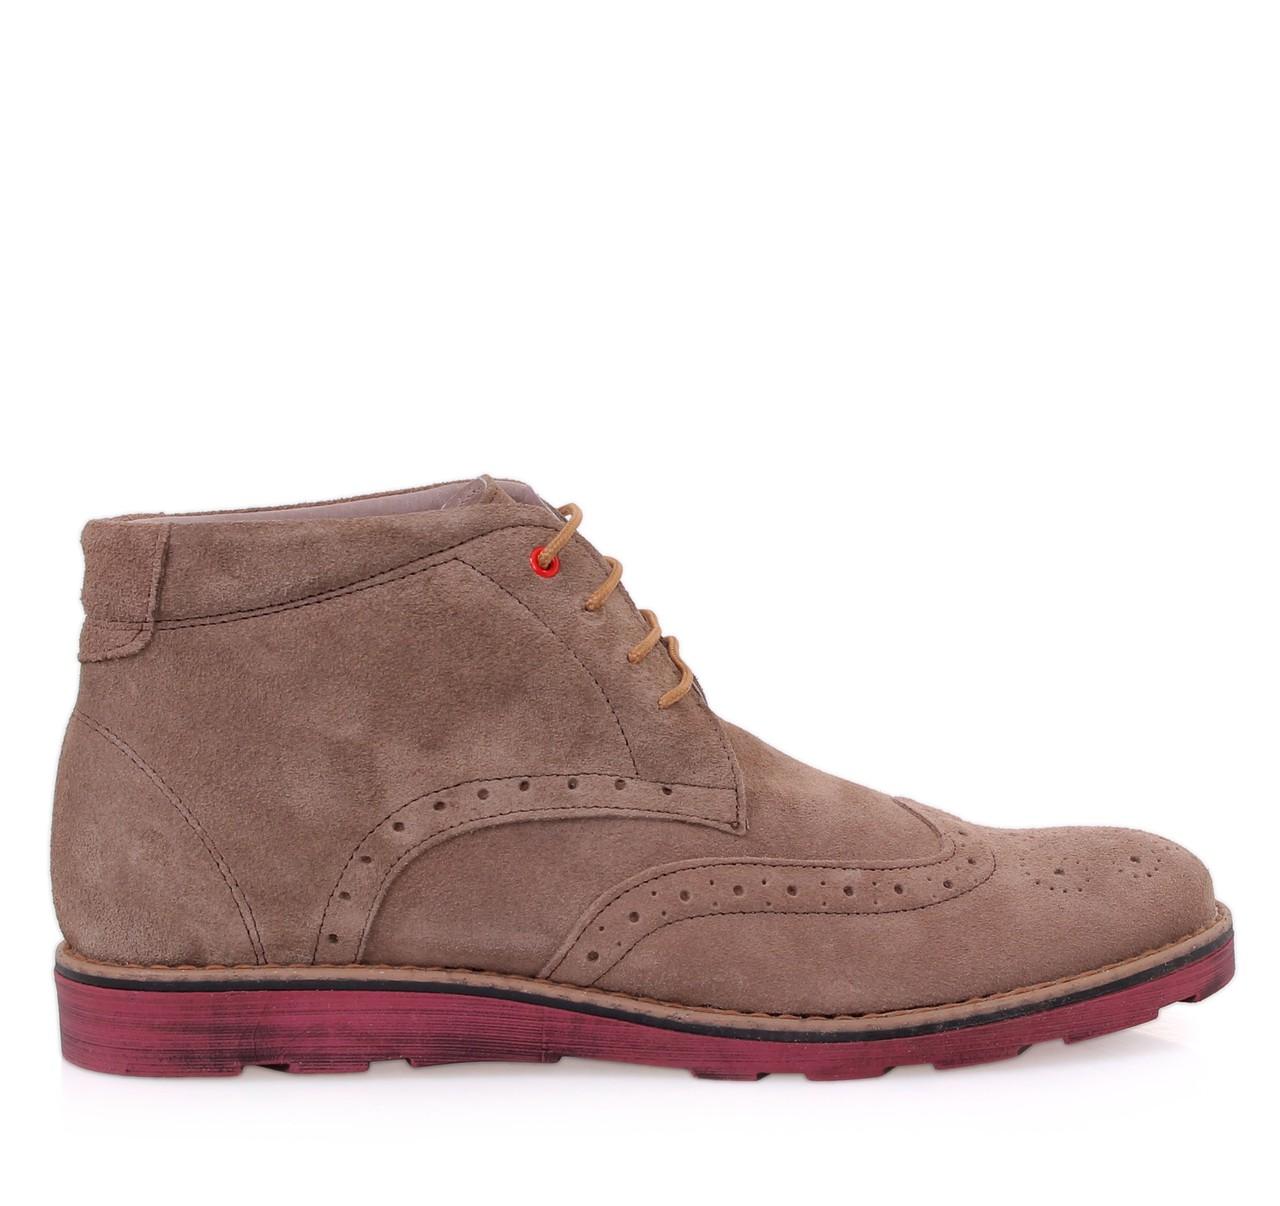 12e9a1ce349 Best Offers > Ενήλικες > Παπούτσια > Μπότες & Μποτάκια / ΓΥΝΑΙΚΕΙΑ ...